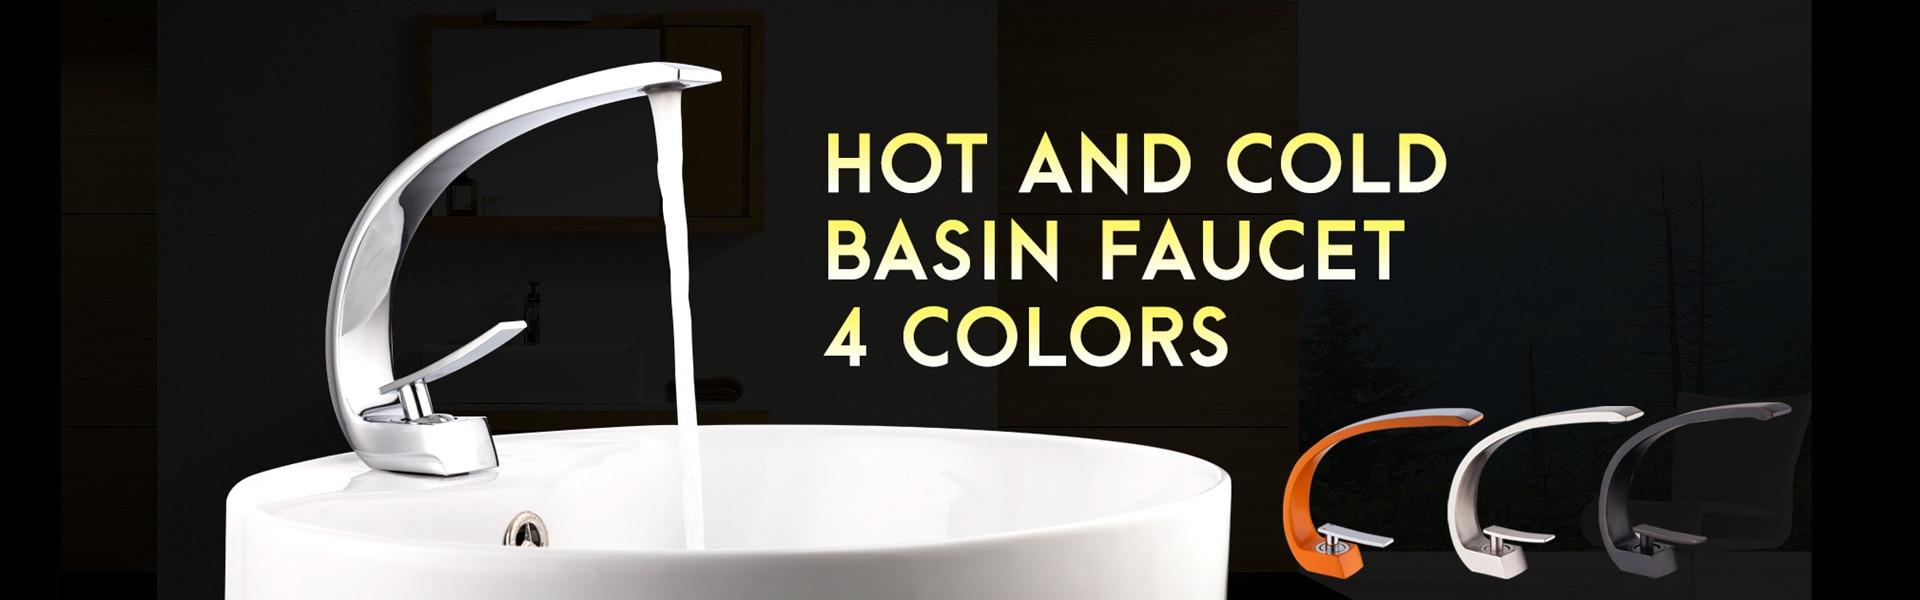 H2d33c63266d941f6a87472e2369952716 Digital Shower Set Matte Black Batroom Faucet Hot Cold Bath Shower System Copper Bath Bidet Luxury Black Thermostatic Shower Set